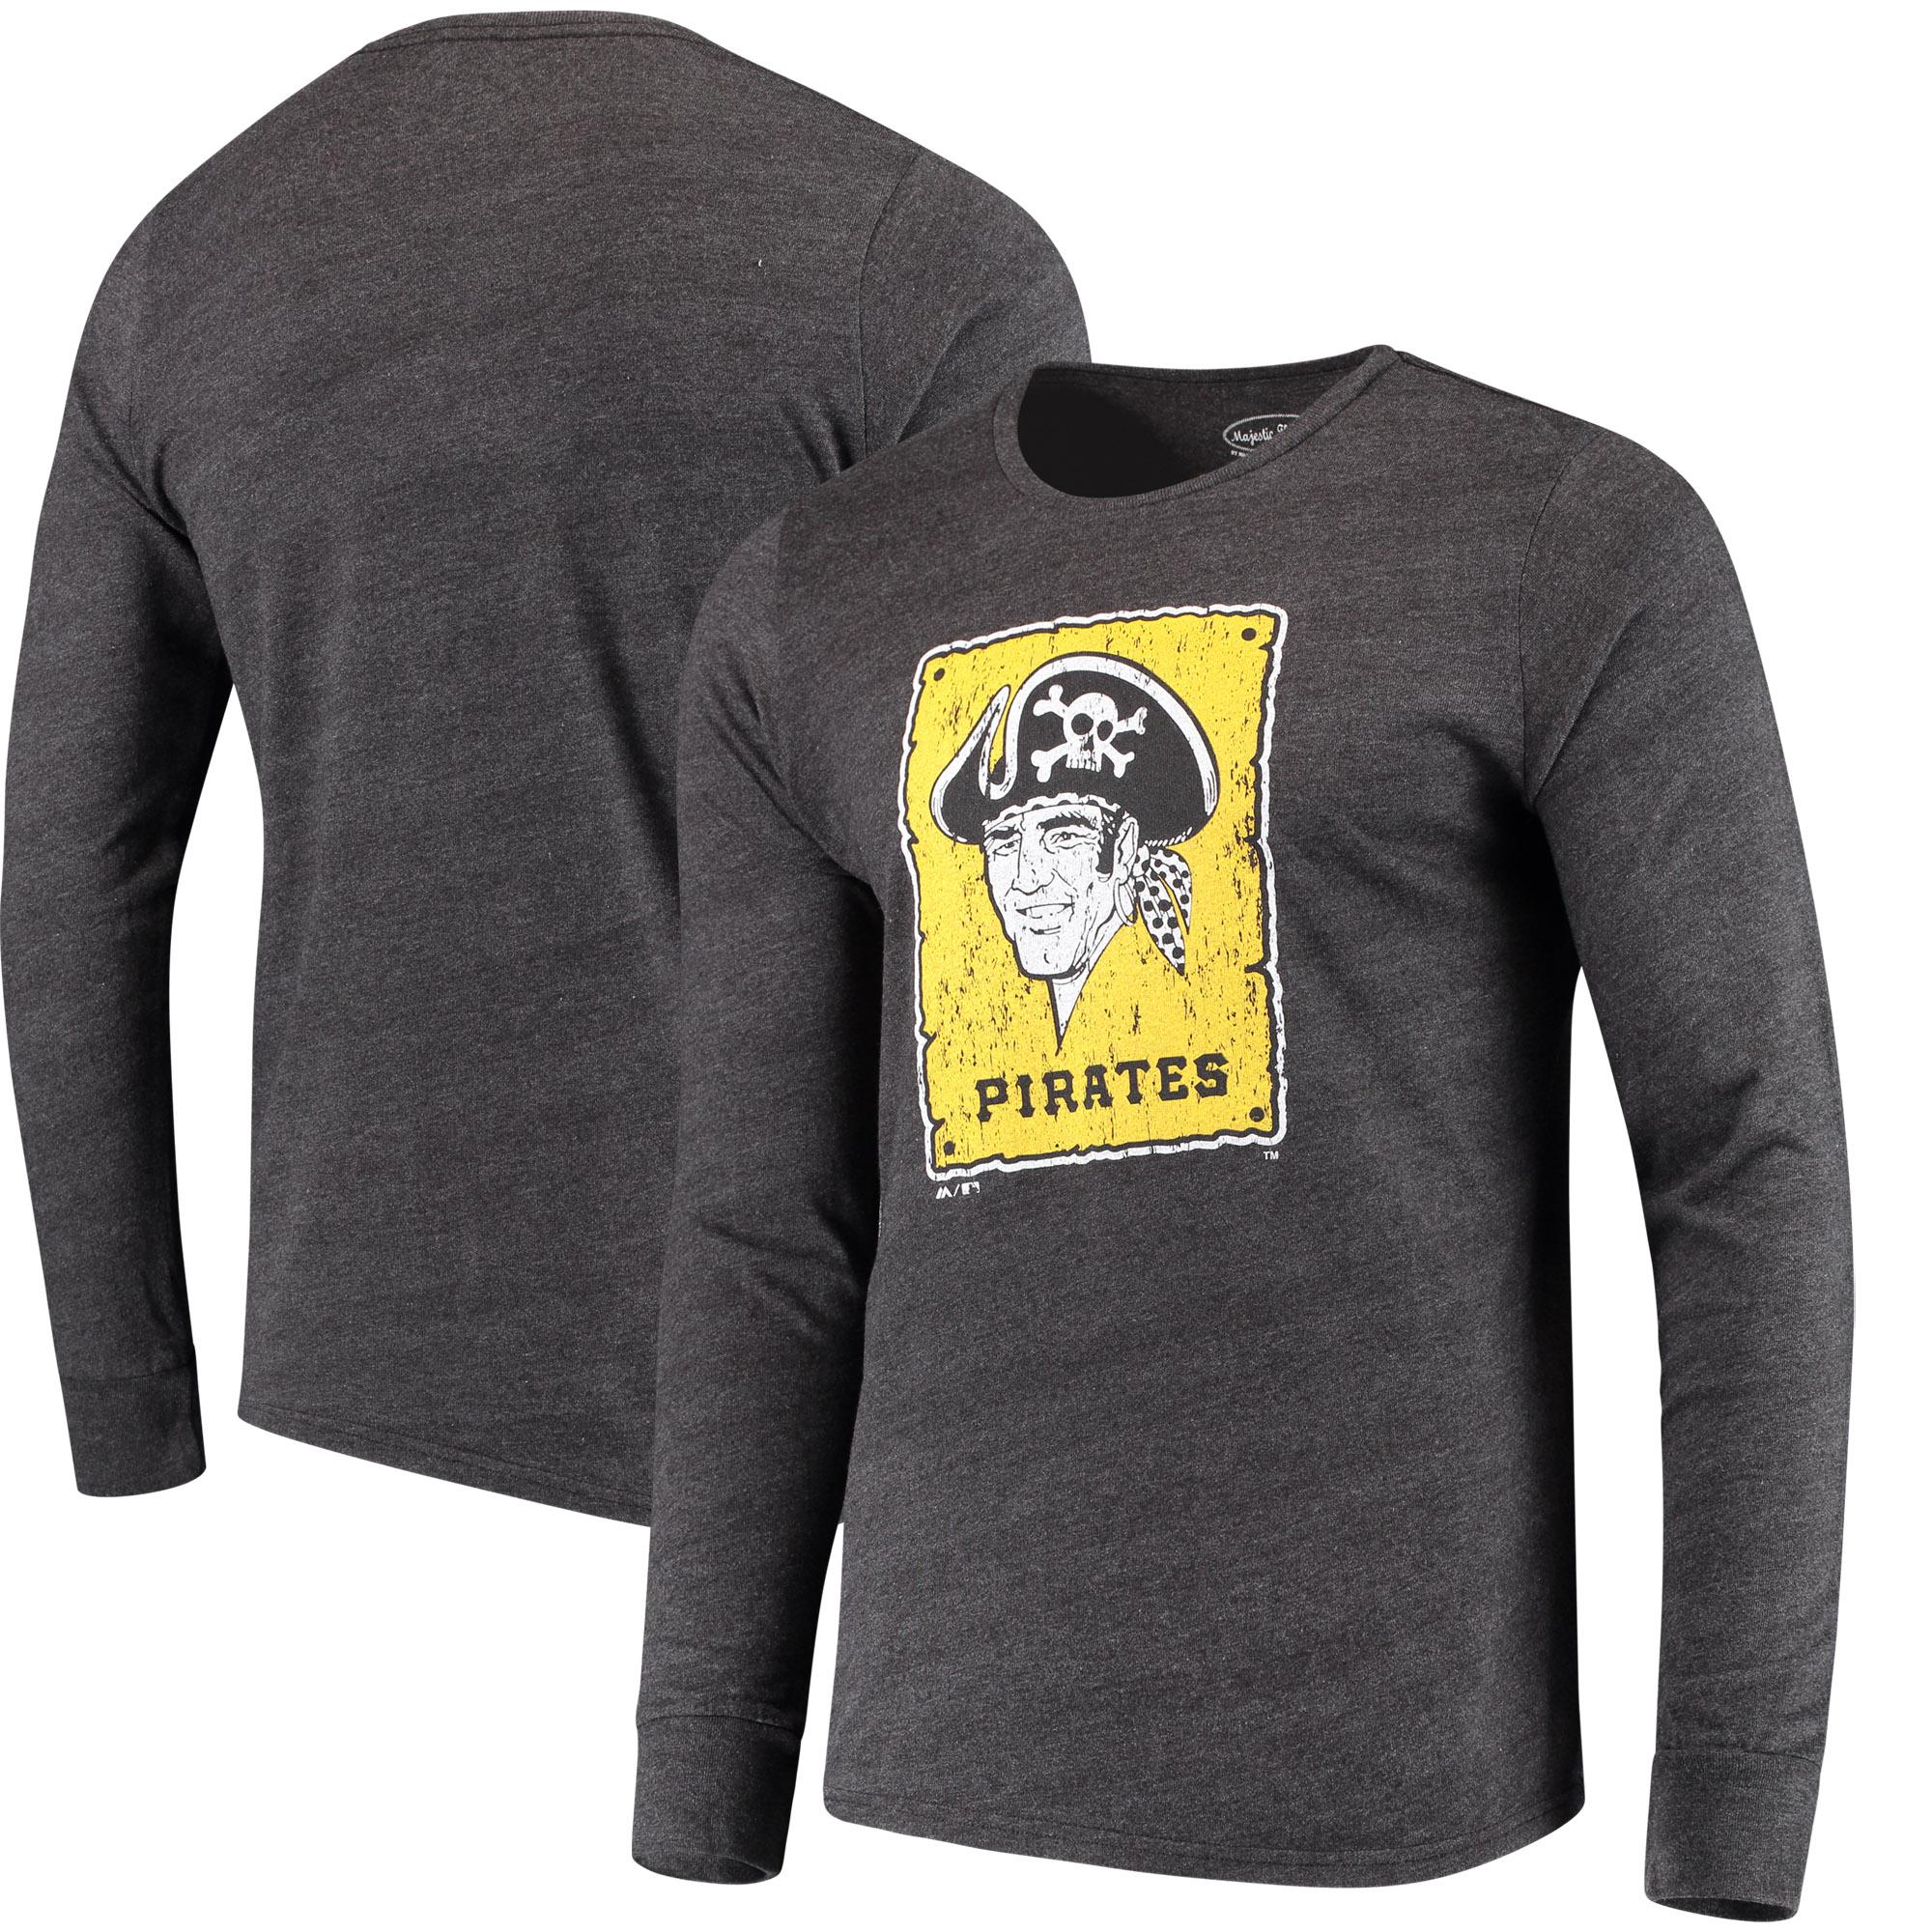 Men's Majestic Threads Heathered Black Pittsburgh Pirates Tri-Blend Long Sleeve T-Shirt